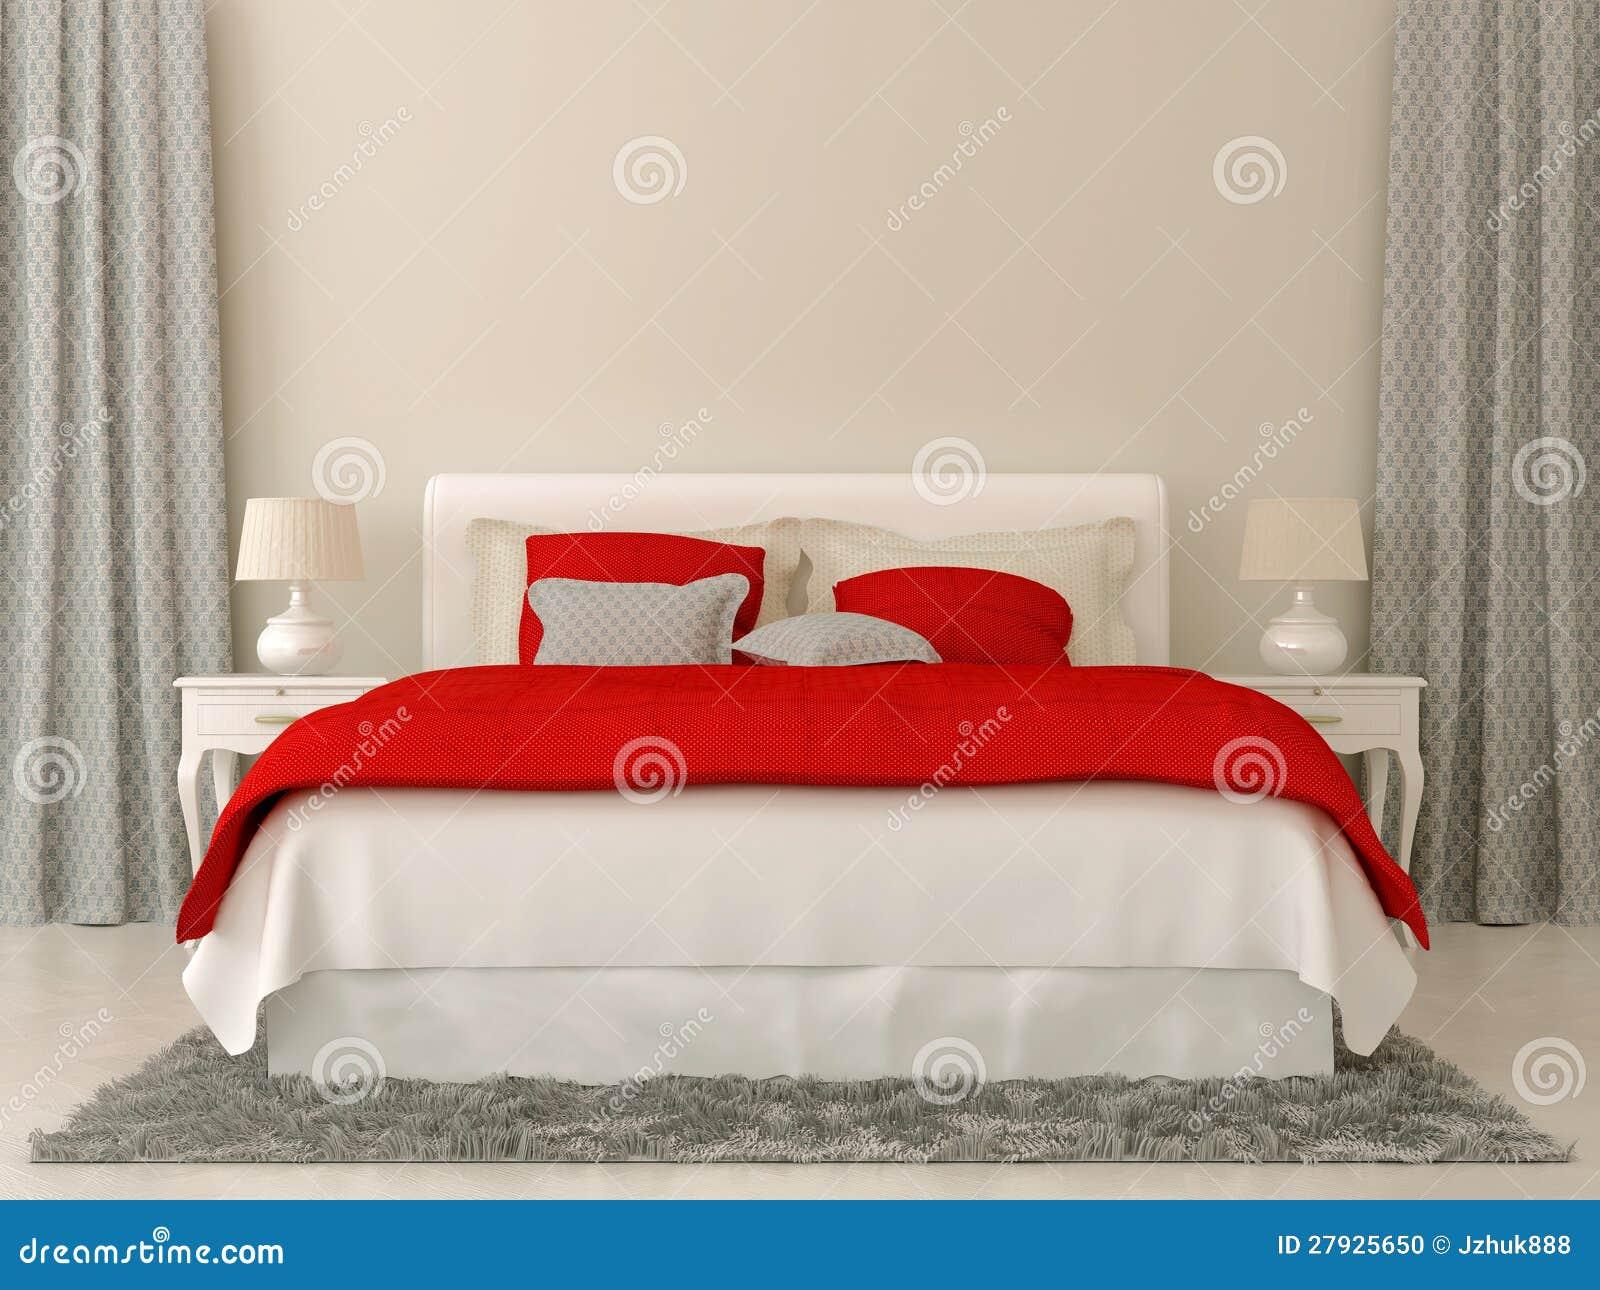 Bordeaux Rode Slaapkamer : Slaapkamer bordeaux. arnaoutchot cottage astria with slaapkamer